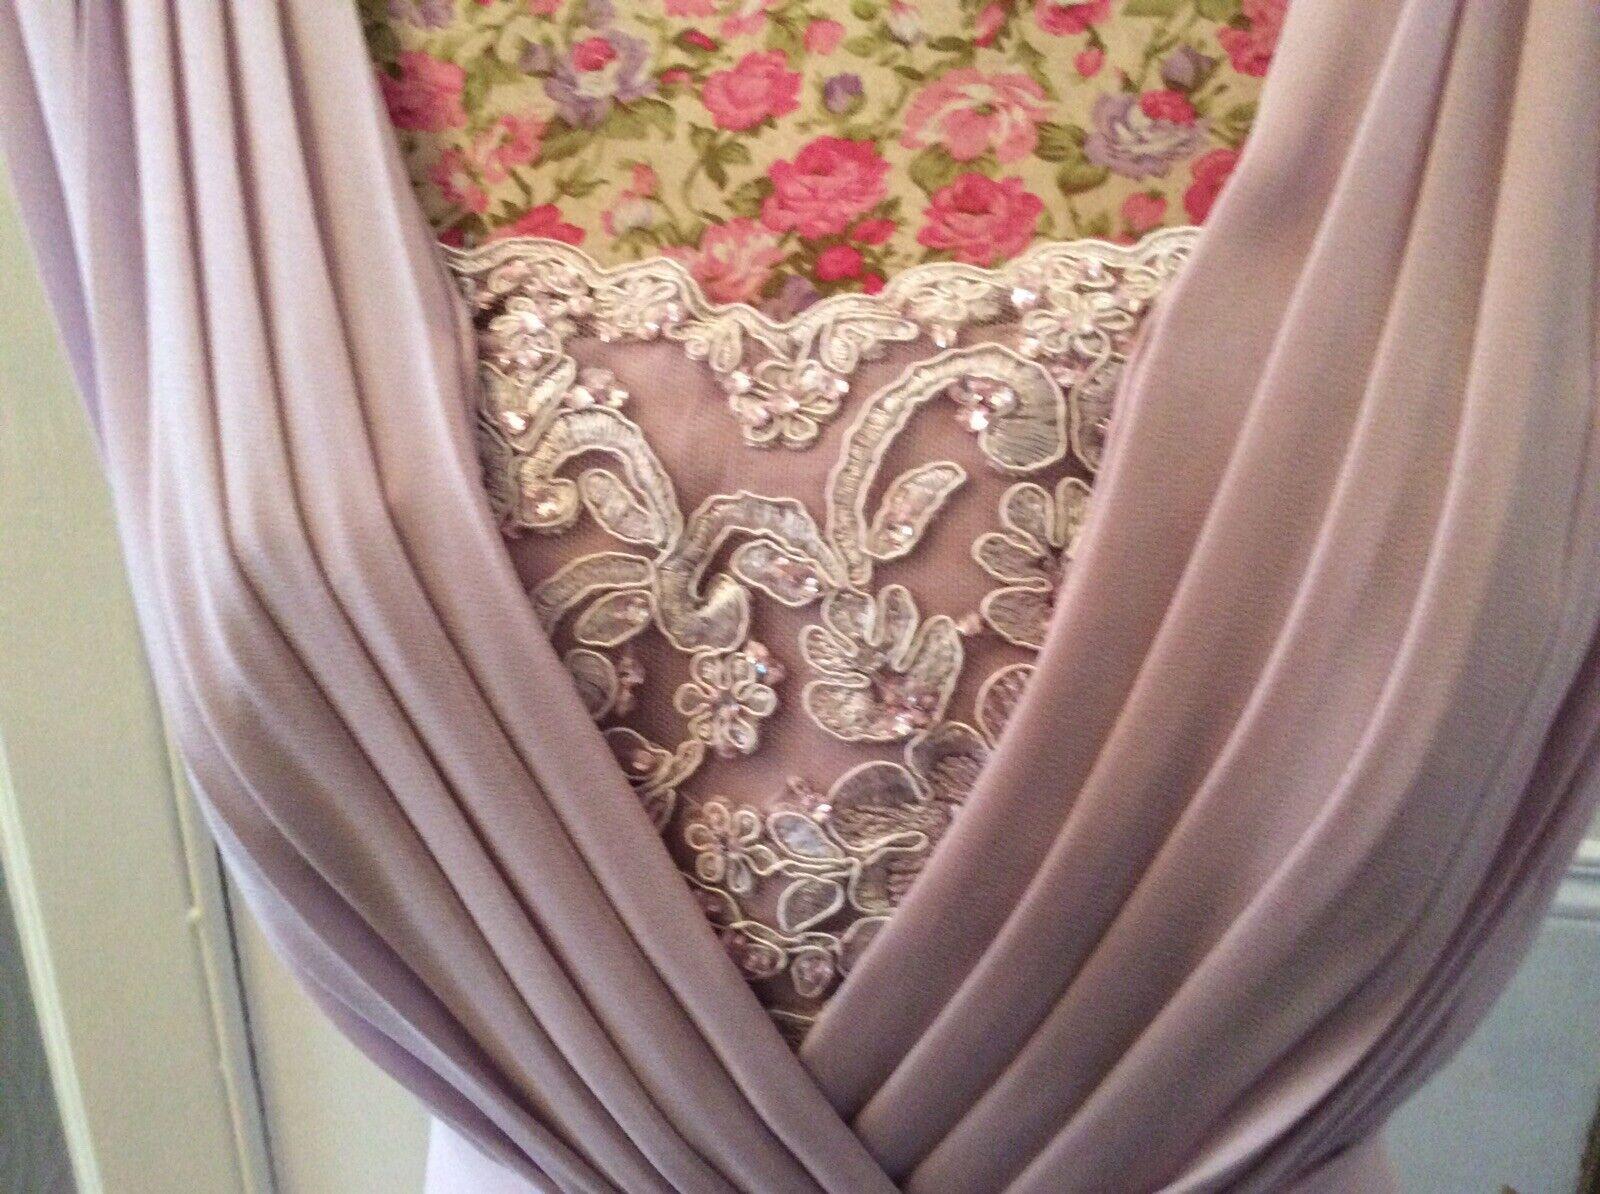 Jacques Vert Dusty Rose dentelle insérer robe de soirée taille 12 Excel Cond Away 4.9